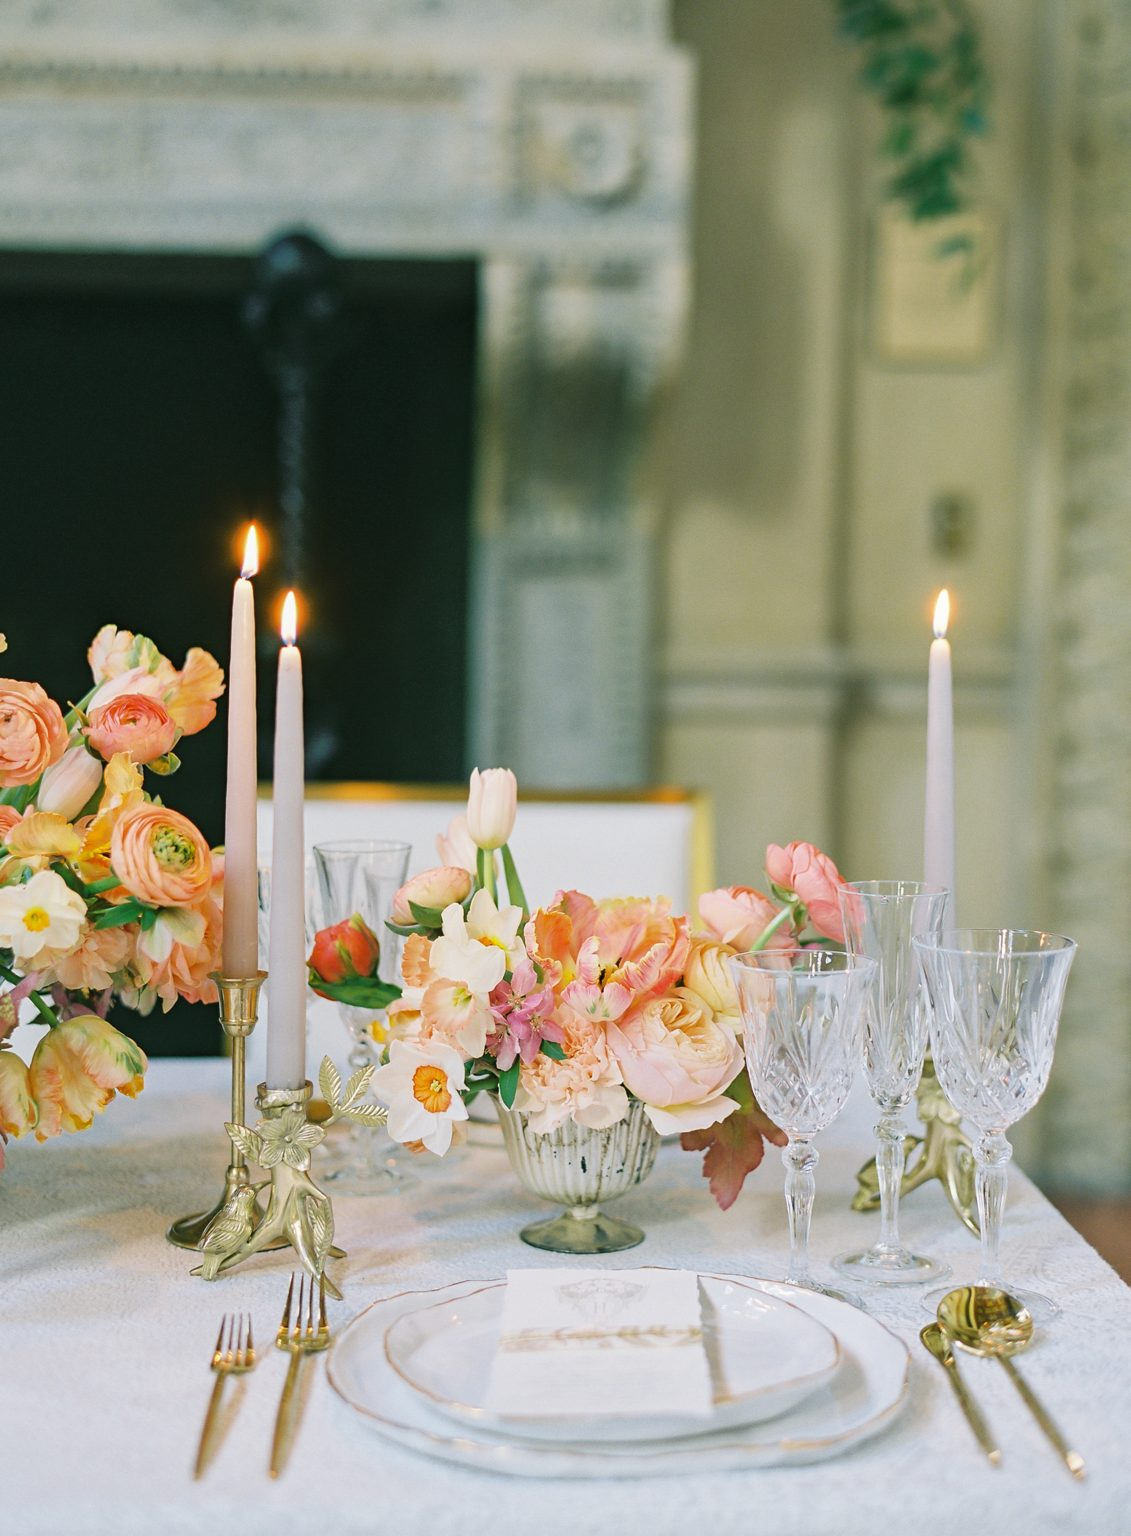 <h2>A sunlit dinner setting in the Ballroom</h2>Photo by Vicki Grafton. Pamela Barefoot Events, planner.